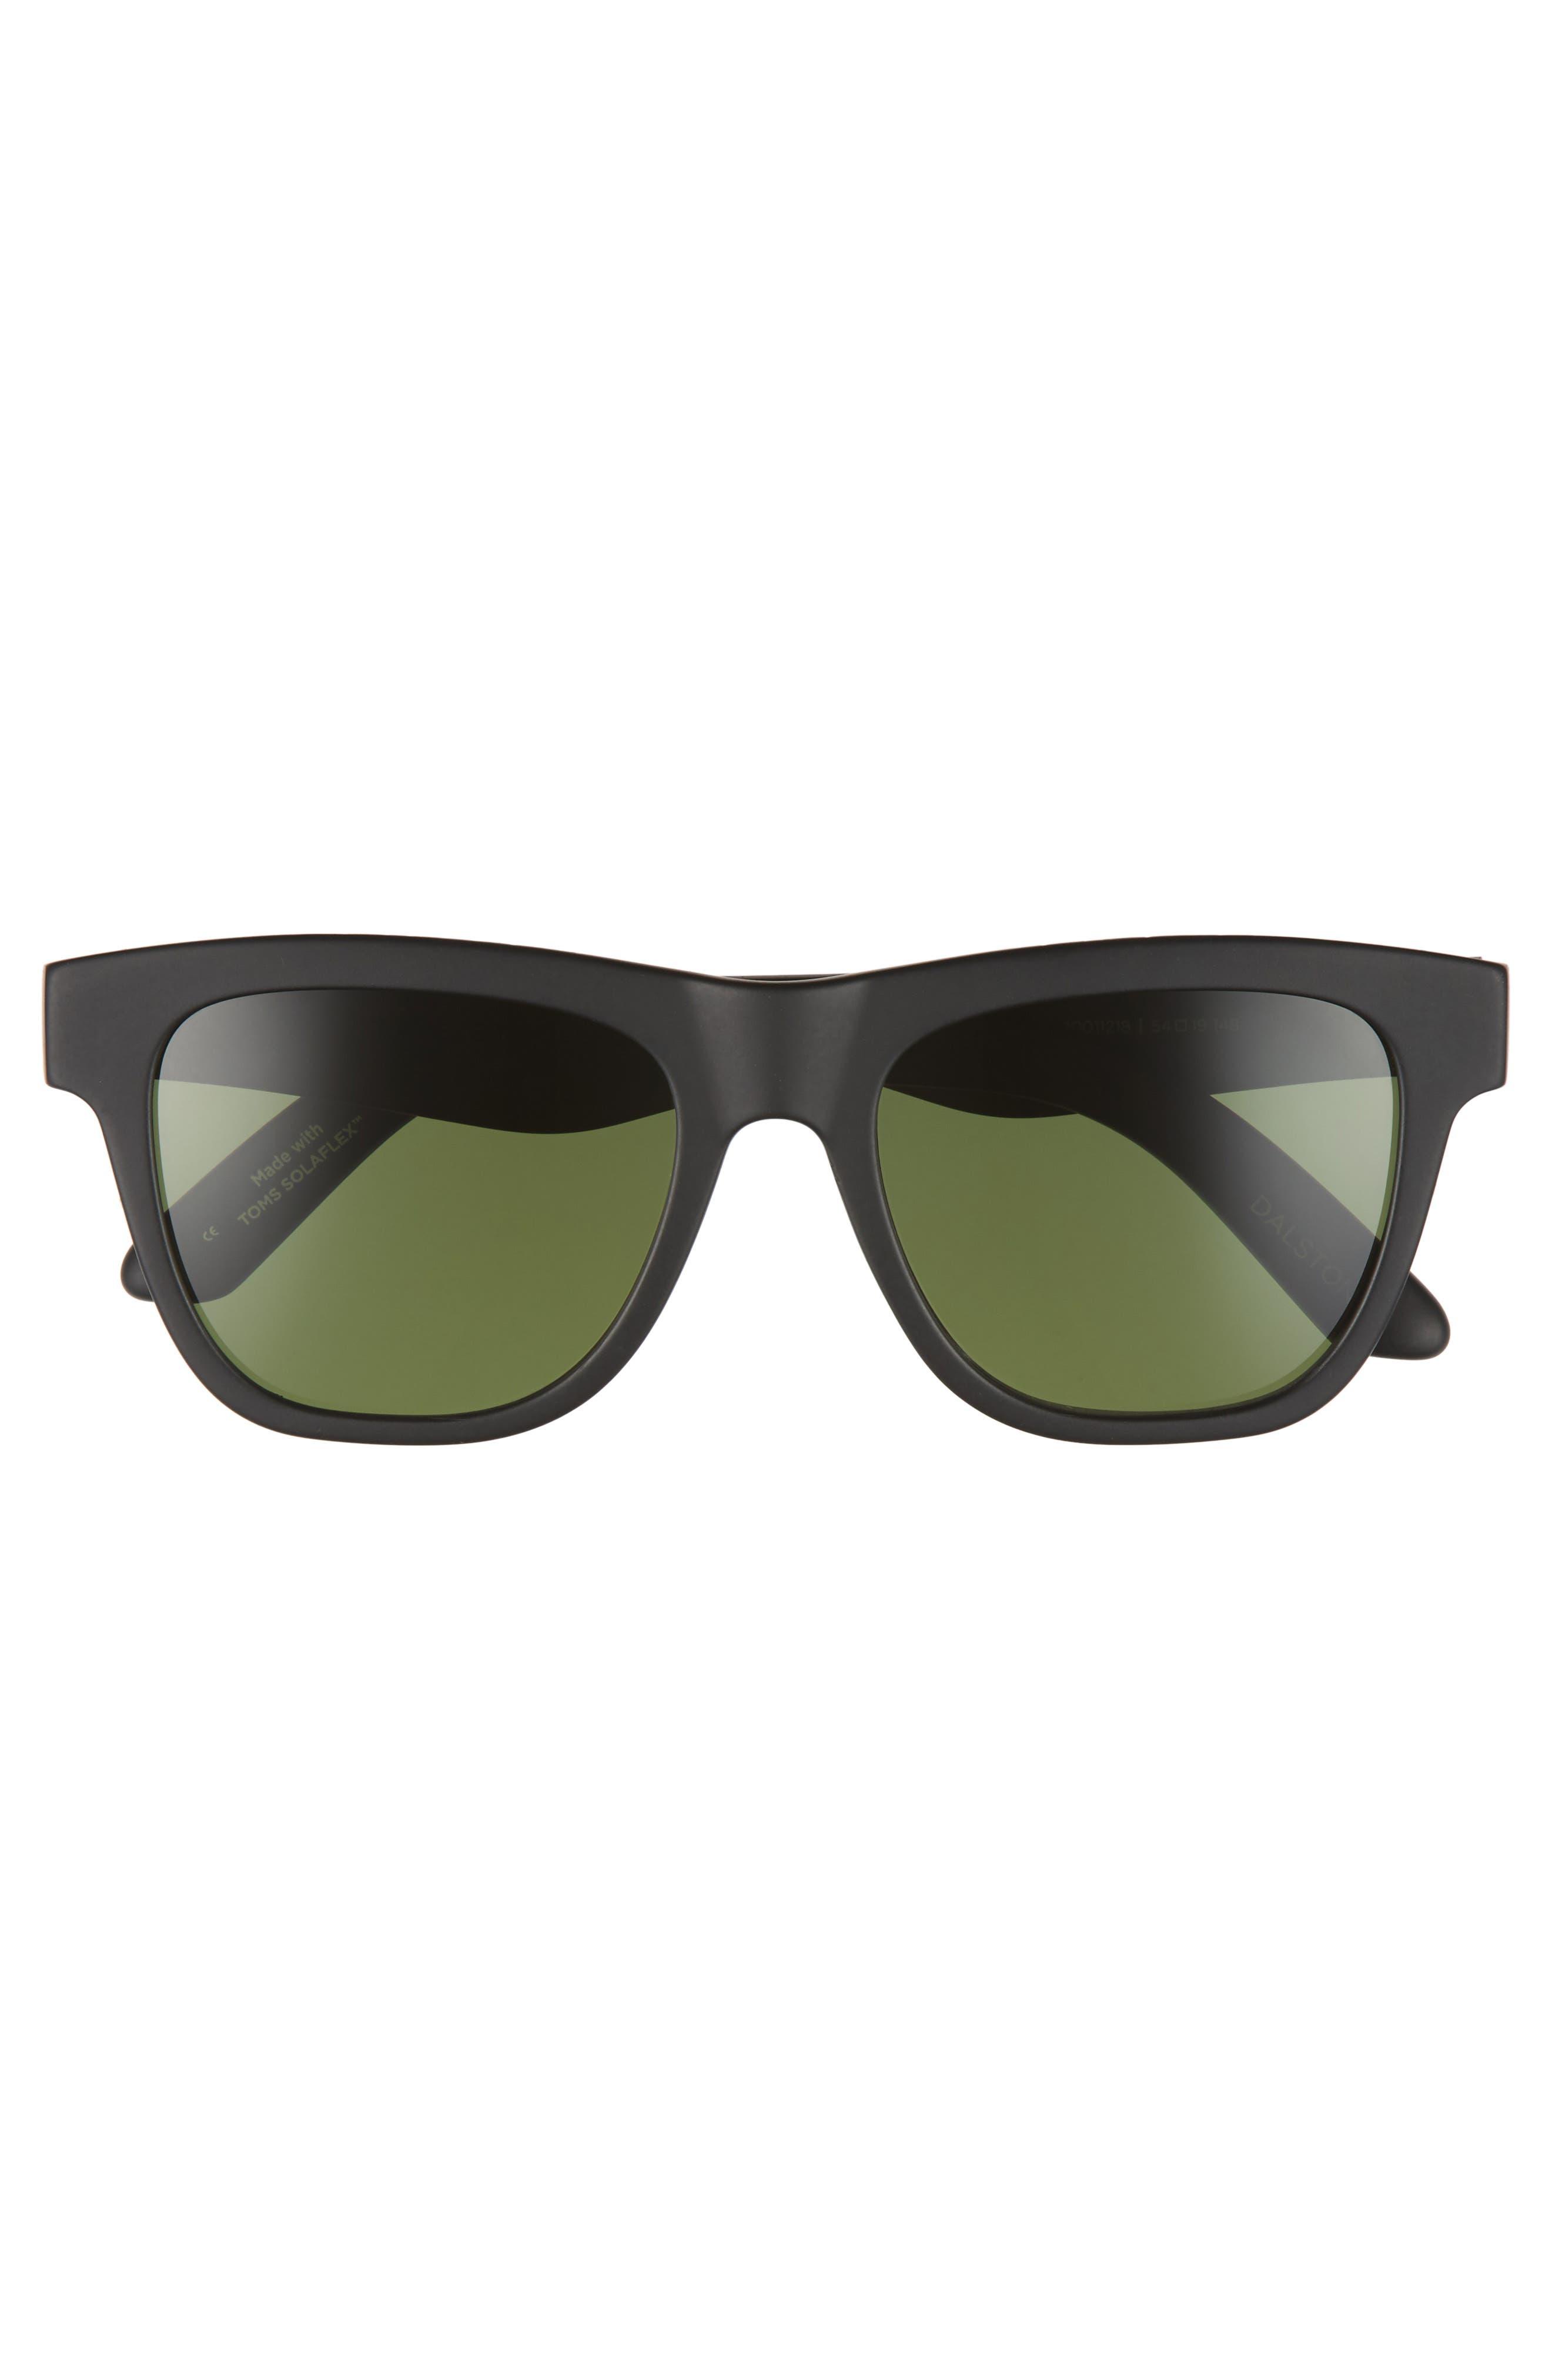 TOMS,                             Dalston 54mm Polarized Sunglasses,                             Alternate thumbnail 2, color,                             001